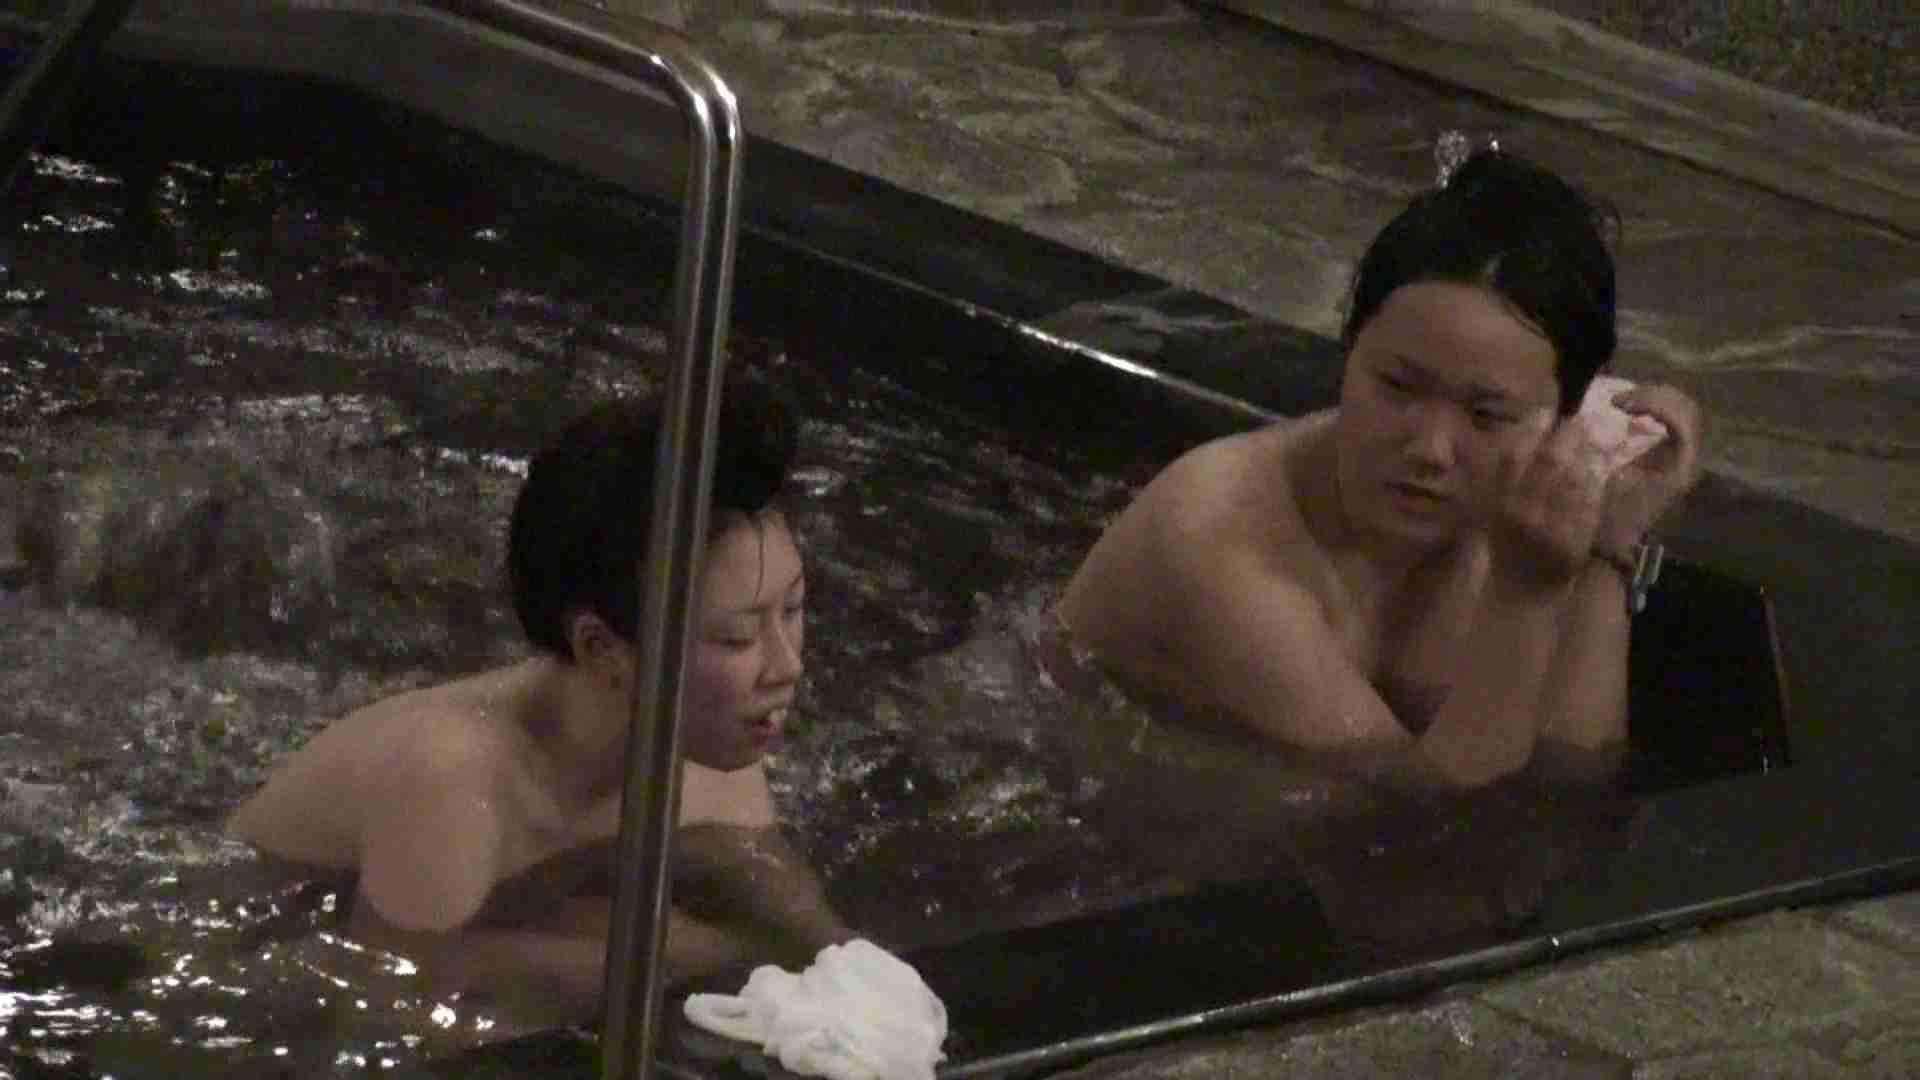 Aquaな露天風呂Vol.382 OLセックス | 盗撮  90画像 7